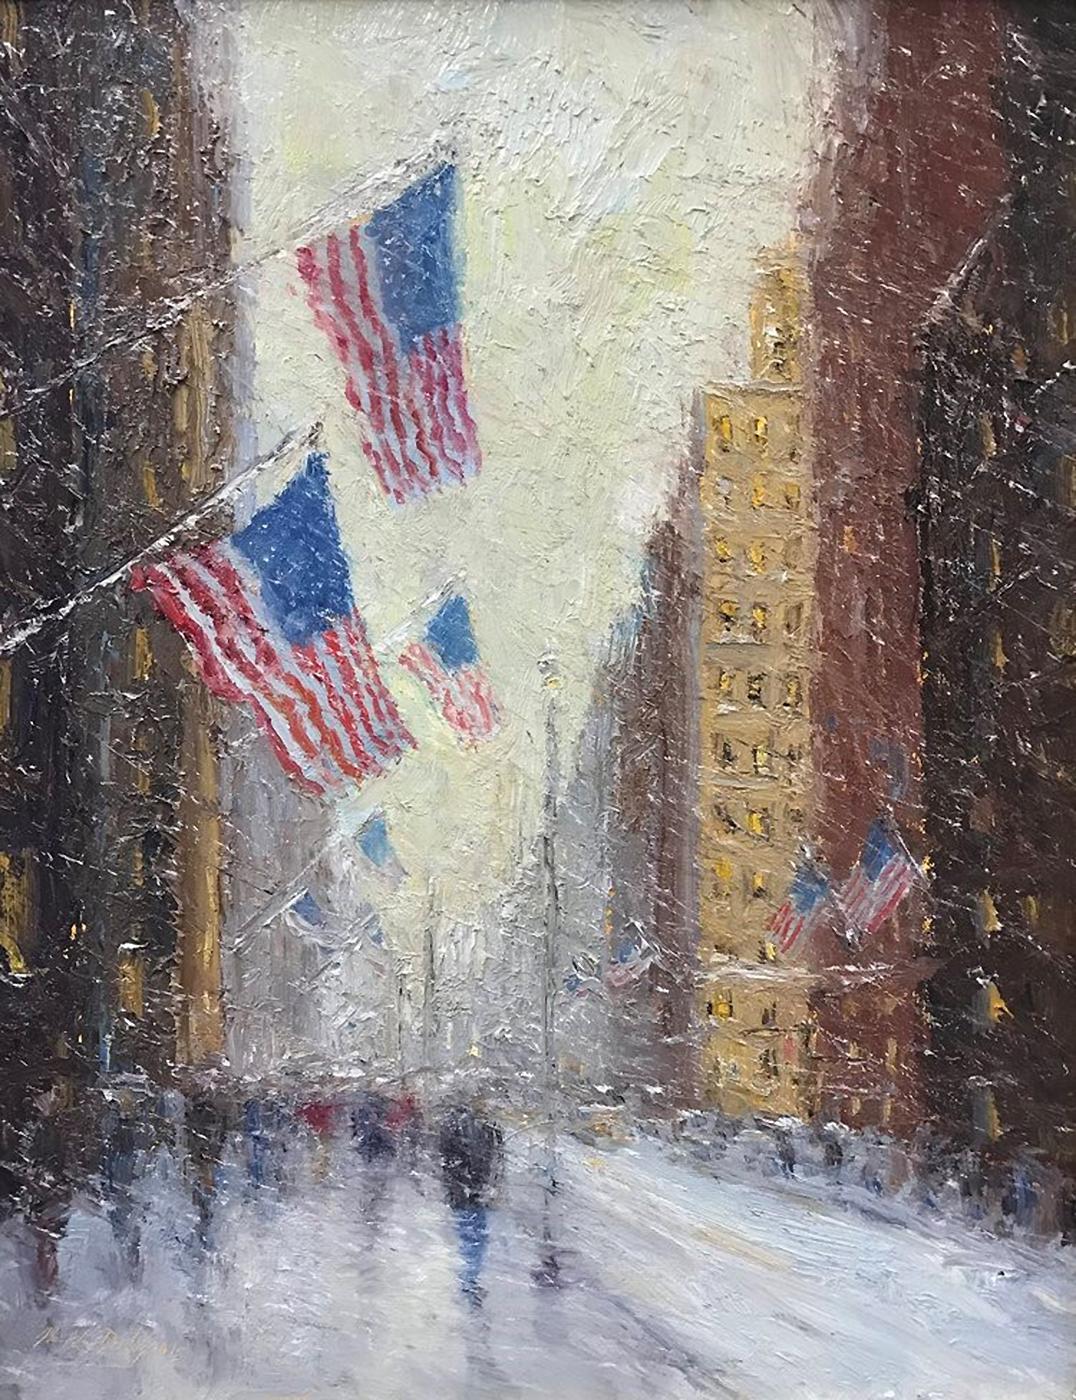 mark_daly_md1040_new_york_winter_flags.jpg